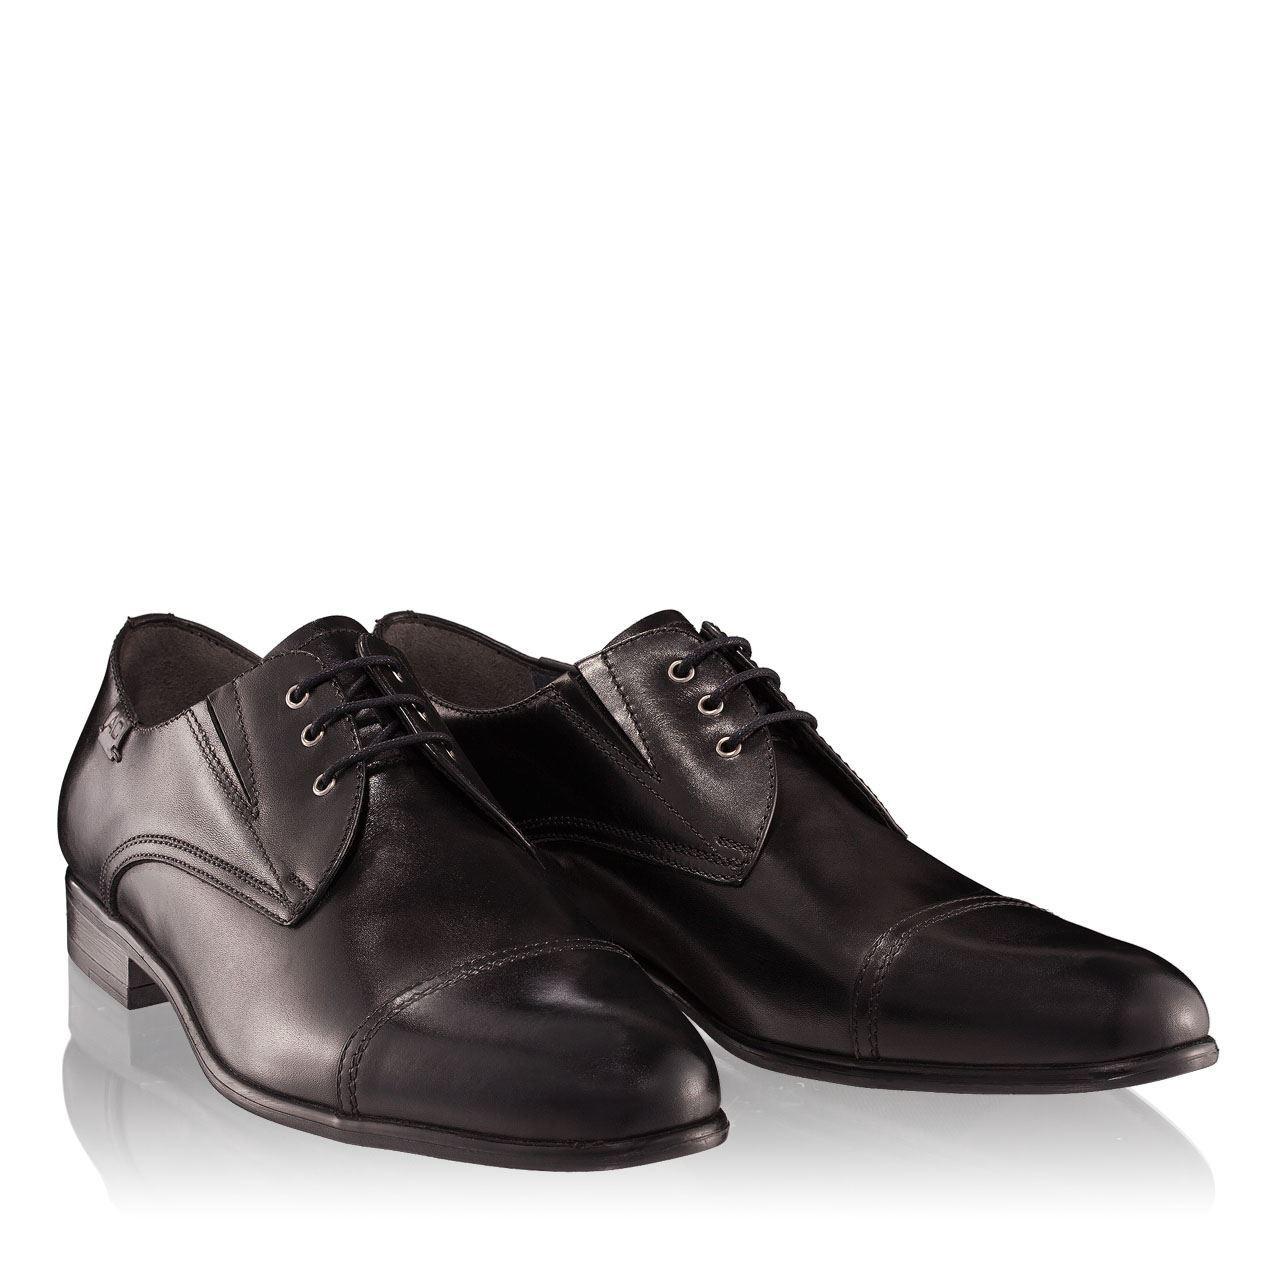 Pantofi barbati negri 2883 piele naturala